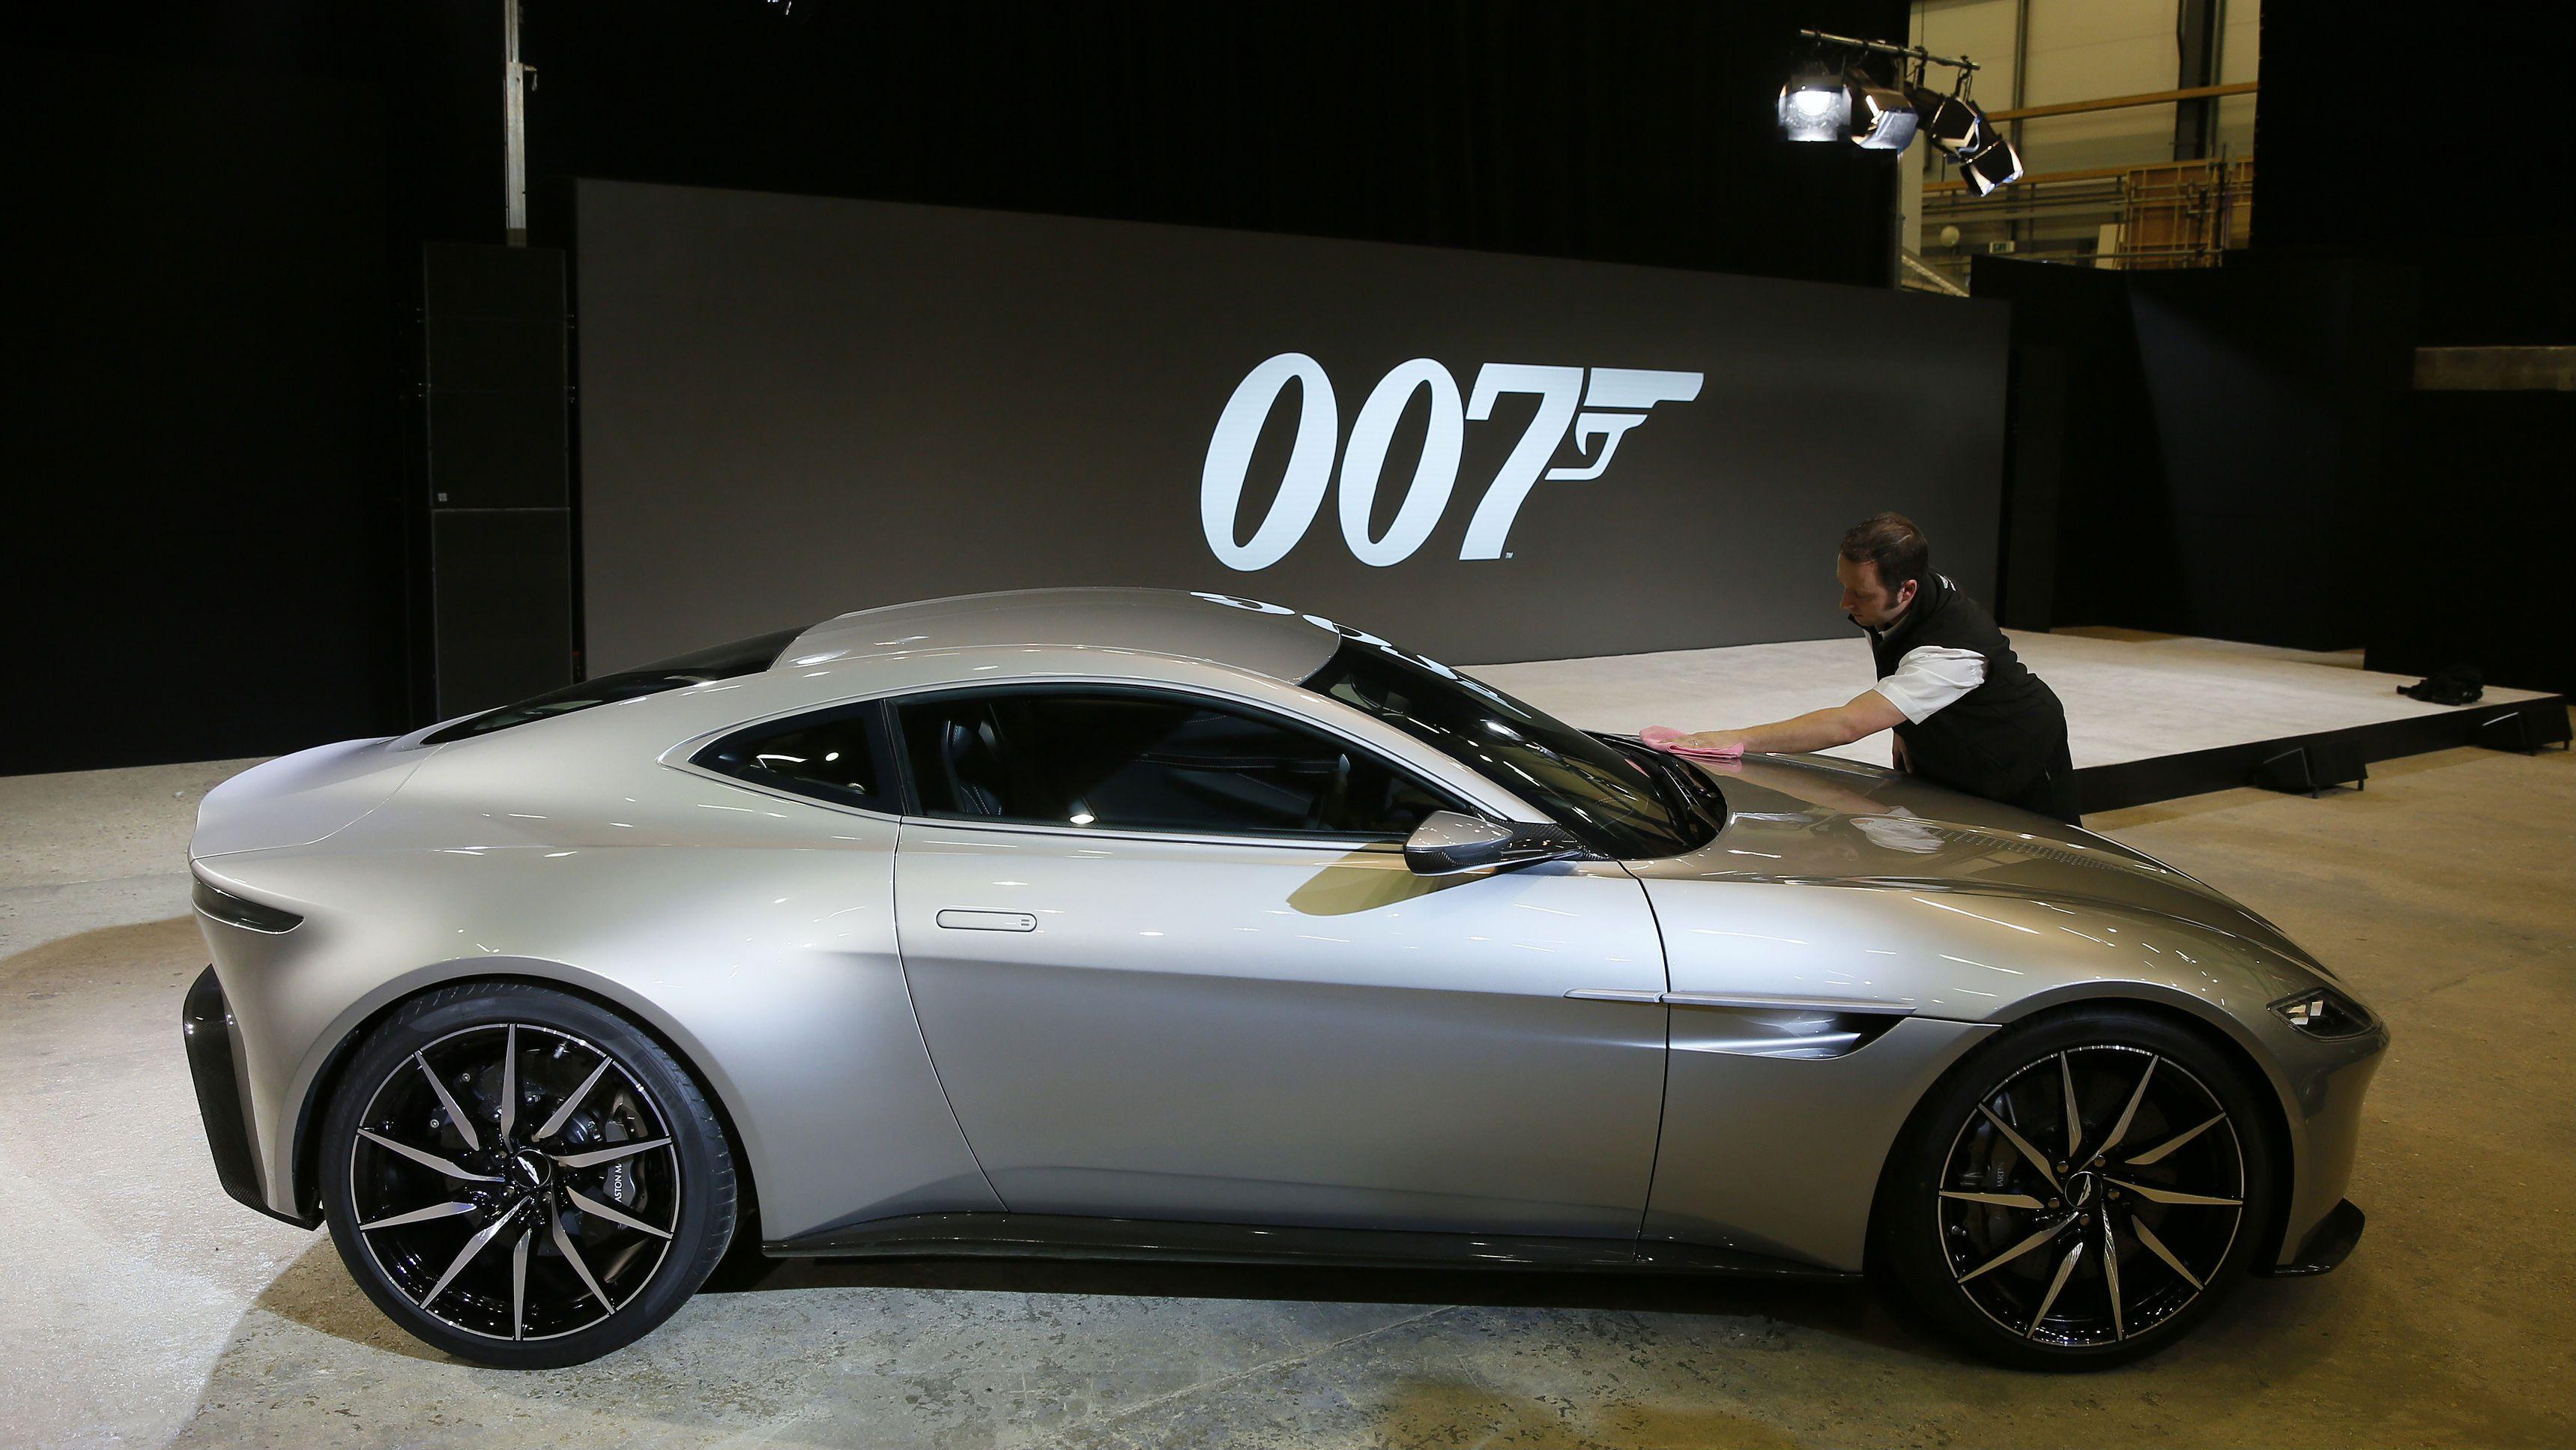 Aston Martin DB10 from James Bond Spectre